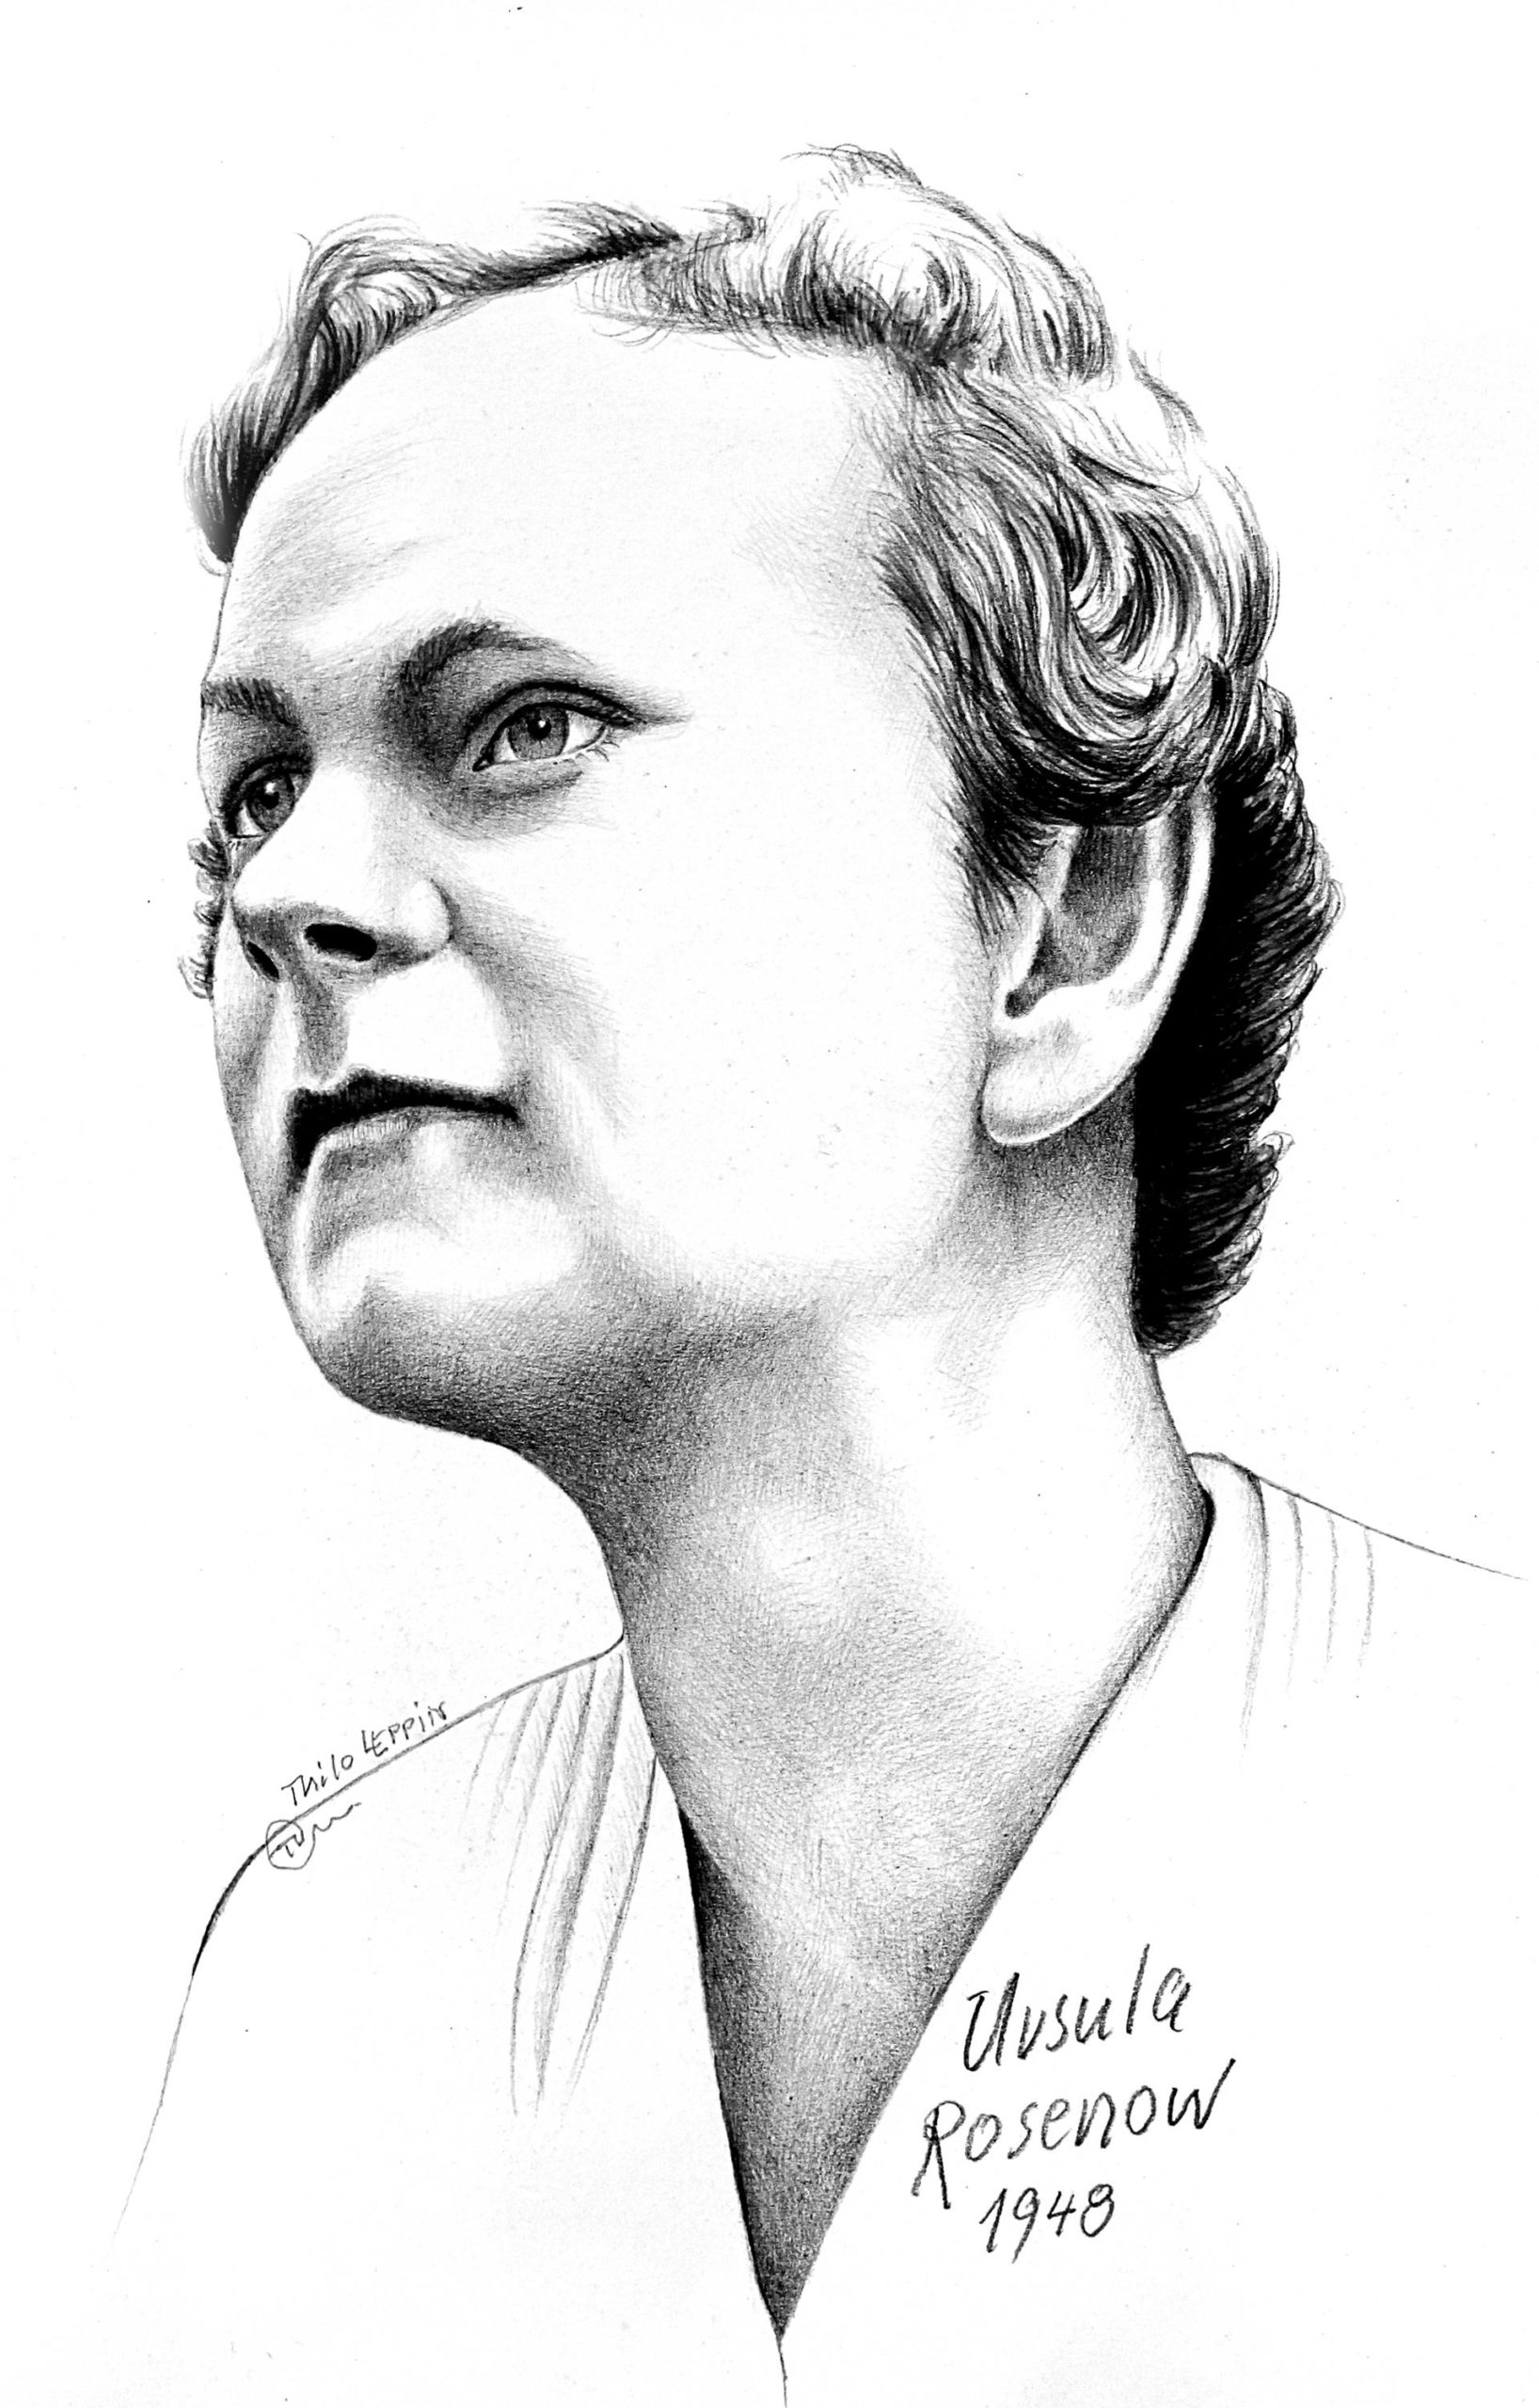 Ursula Rosenow